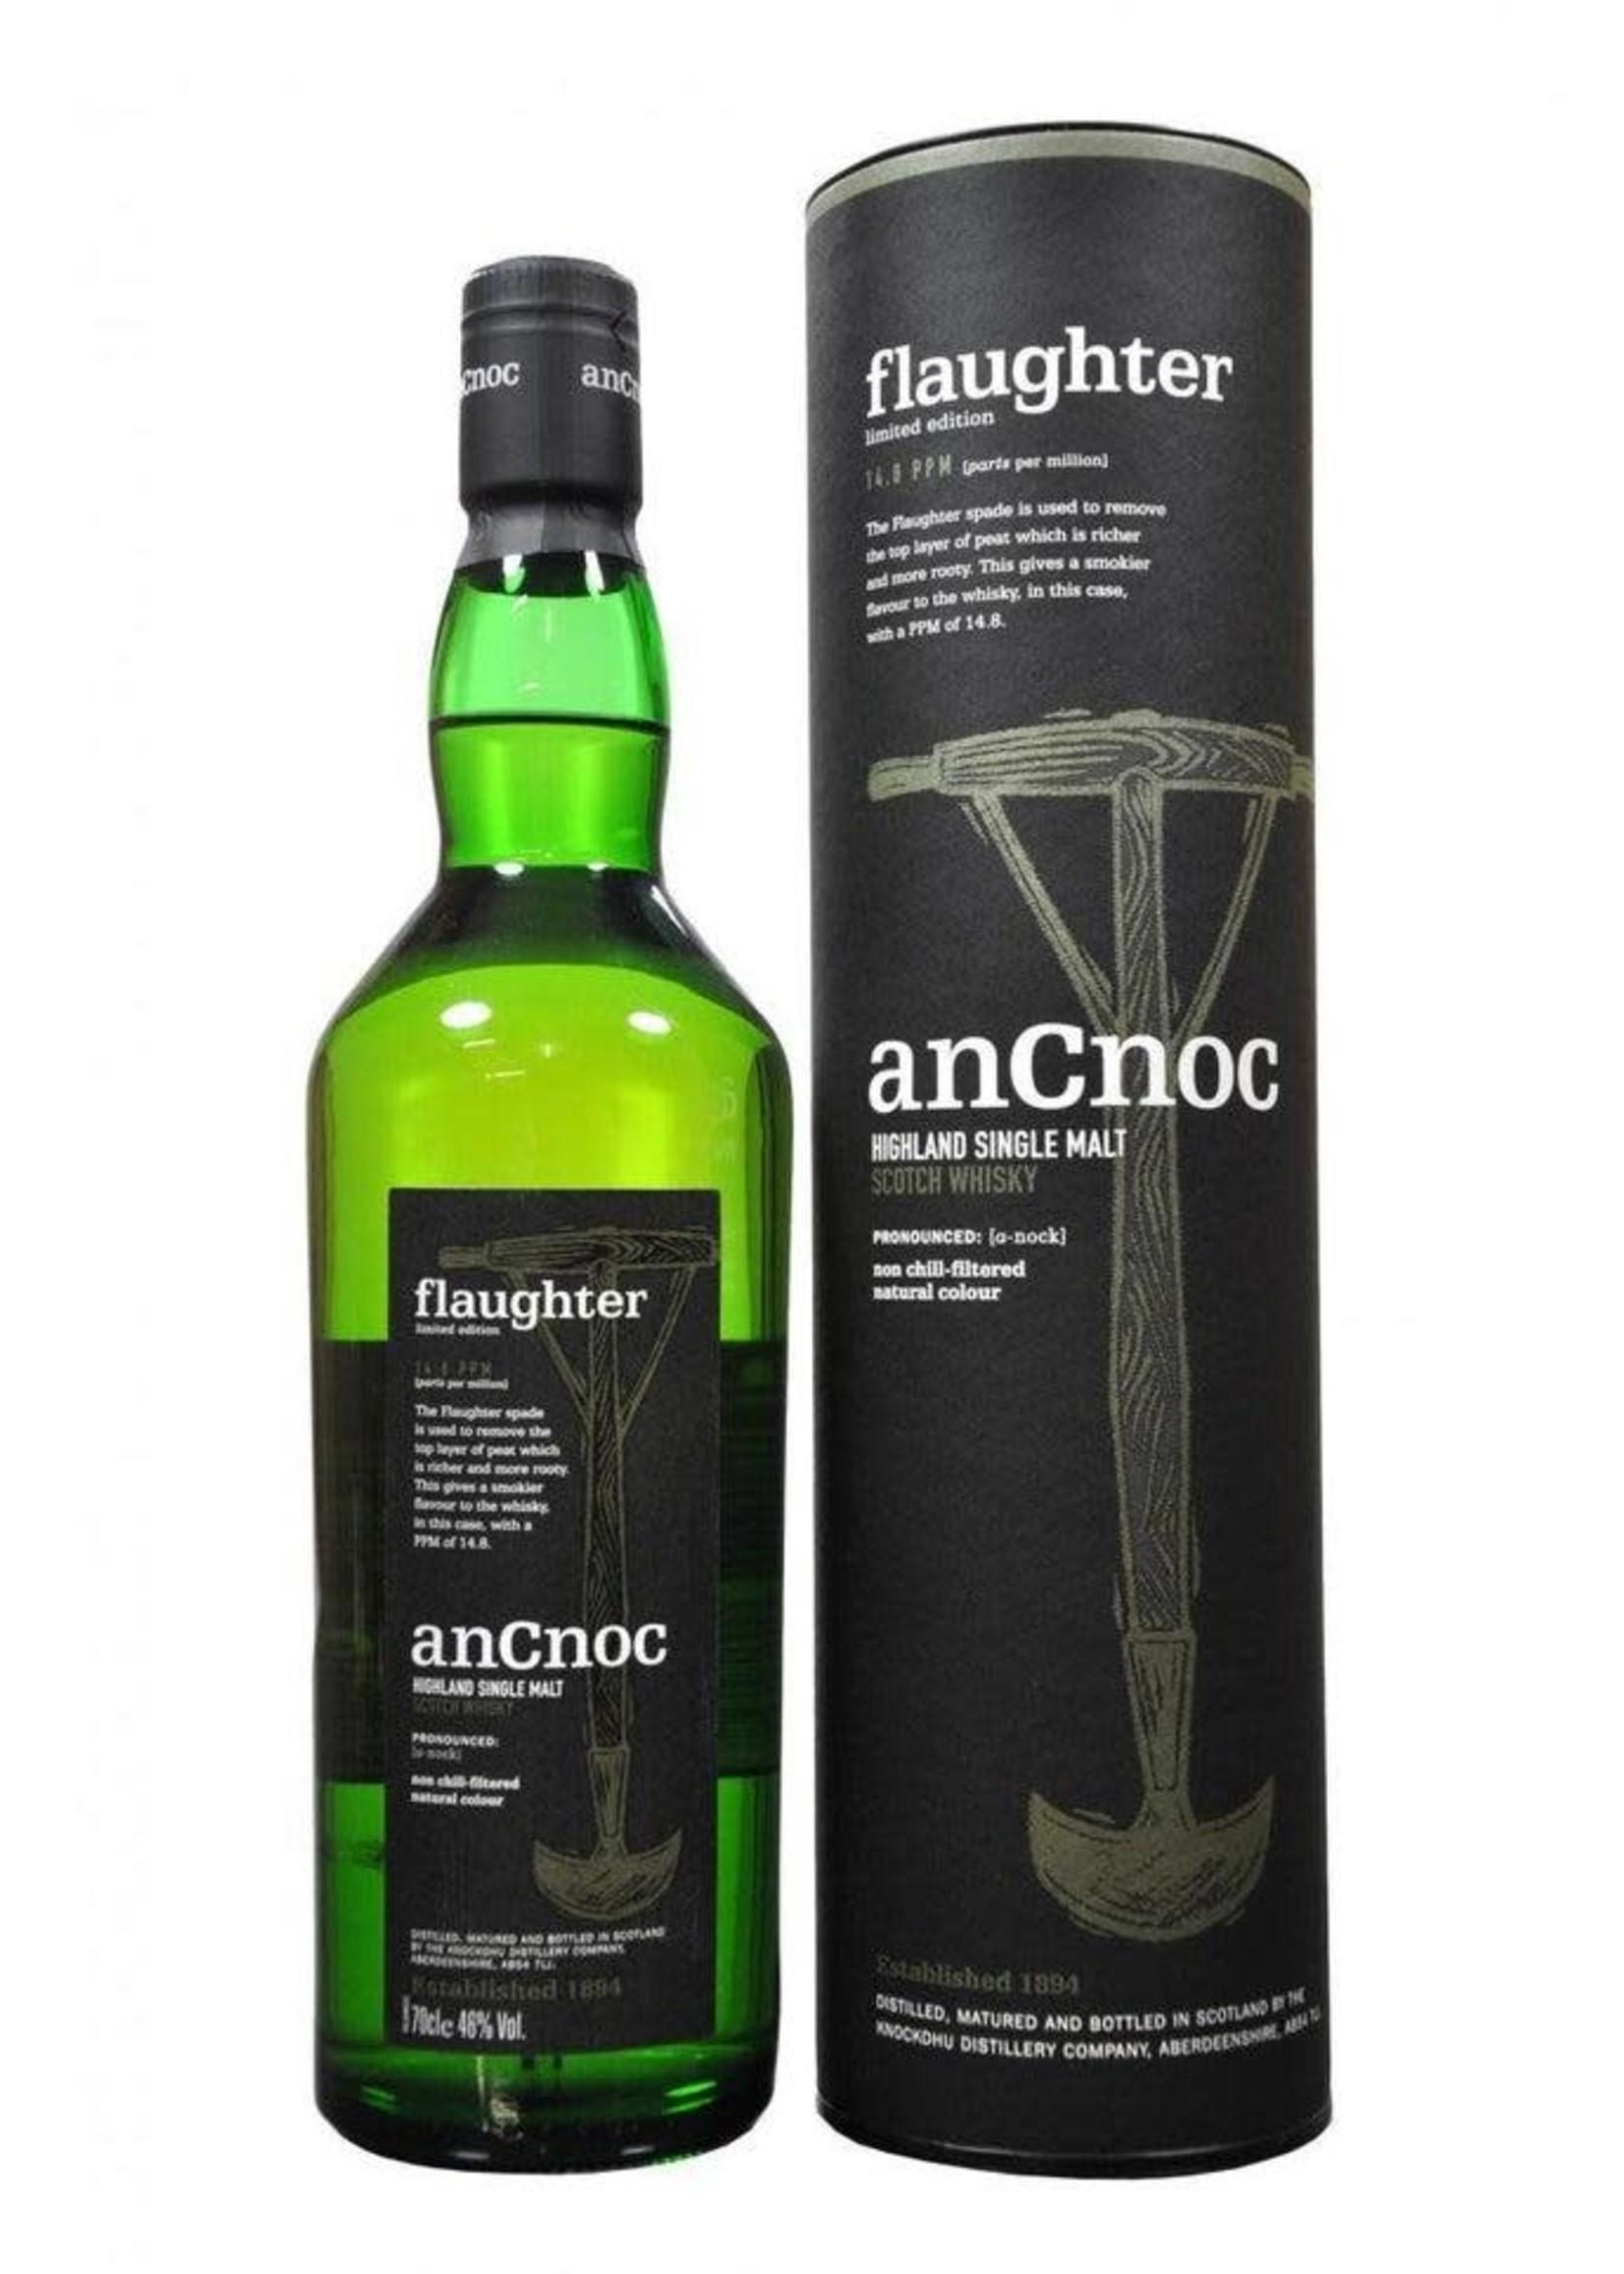 Ancnoc Ancnoc / Flaughter Limited Edition Single Malt Scotch Whisky / 750mL